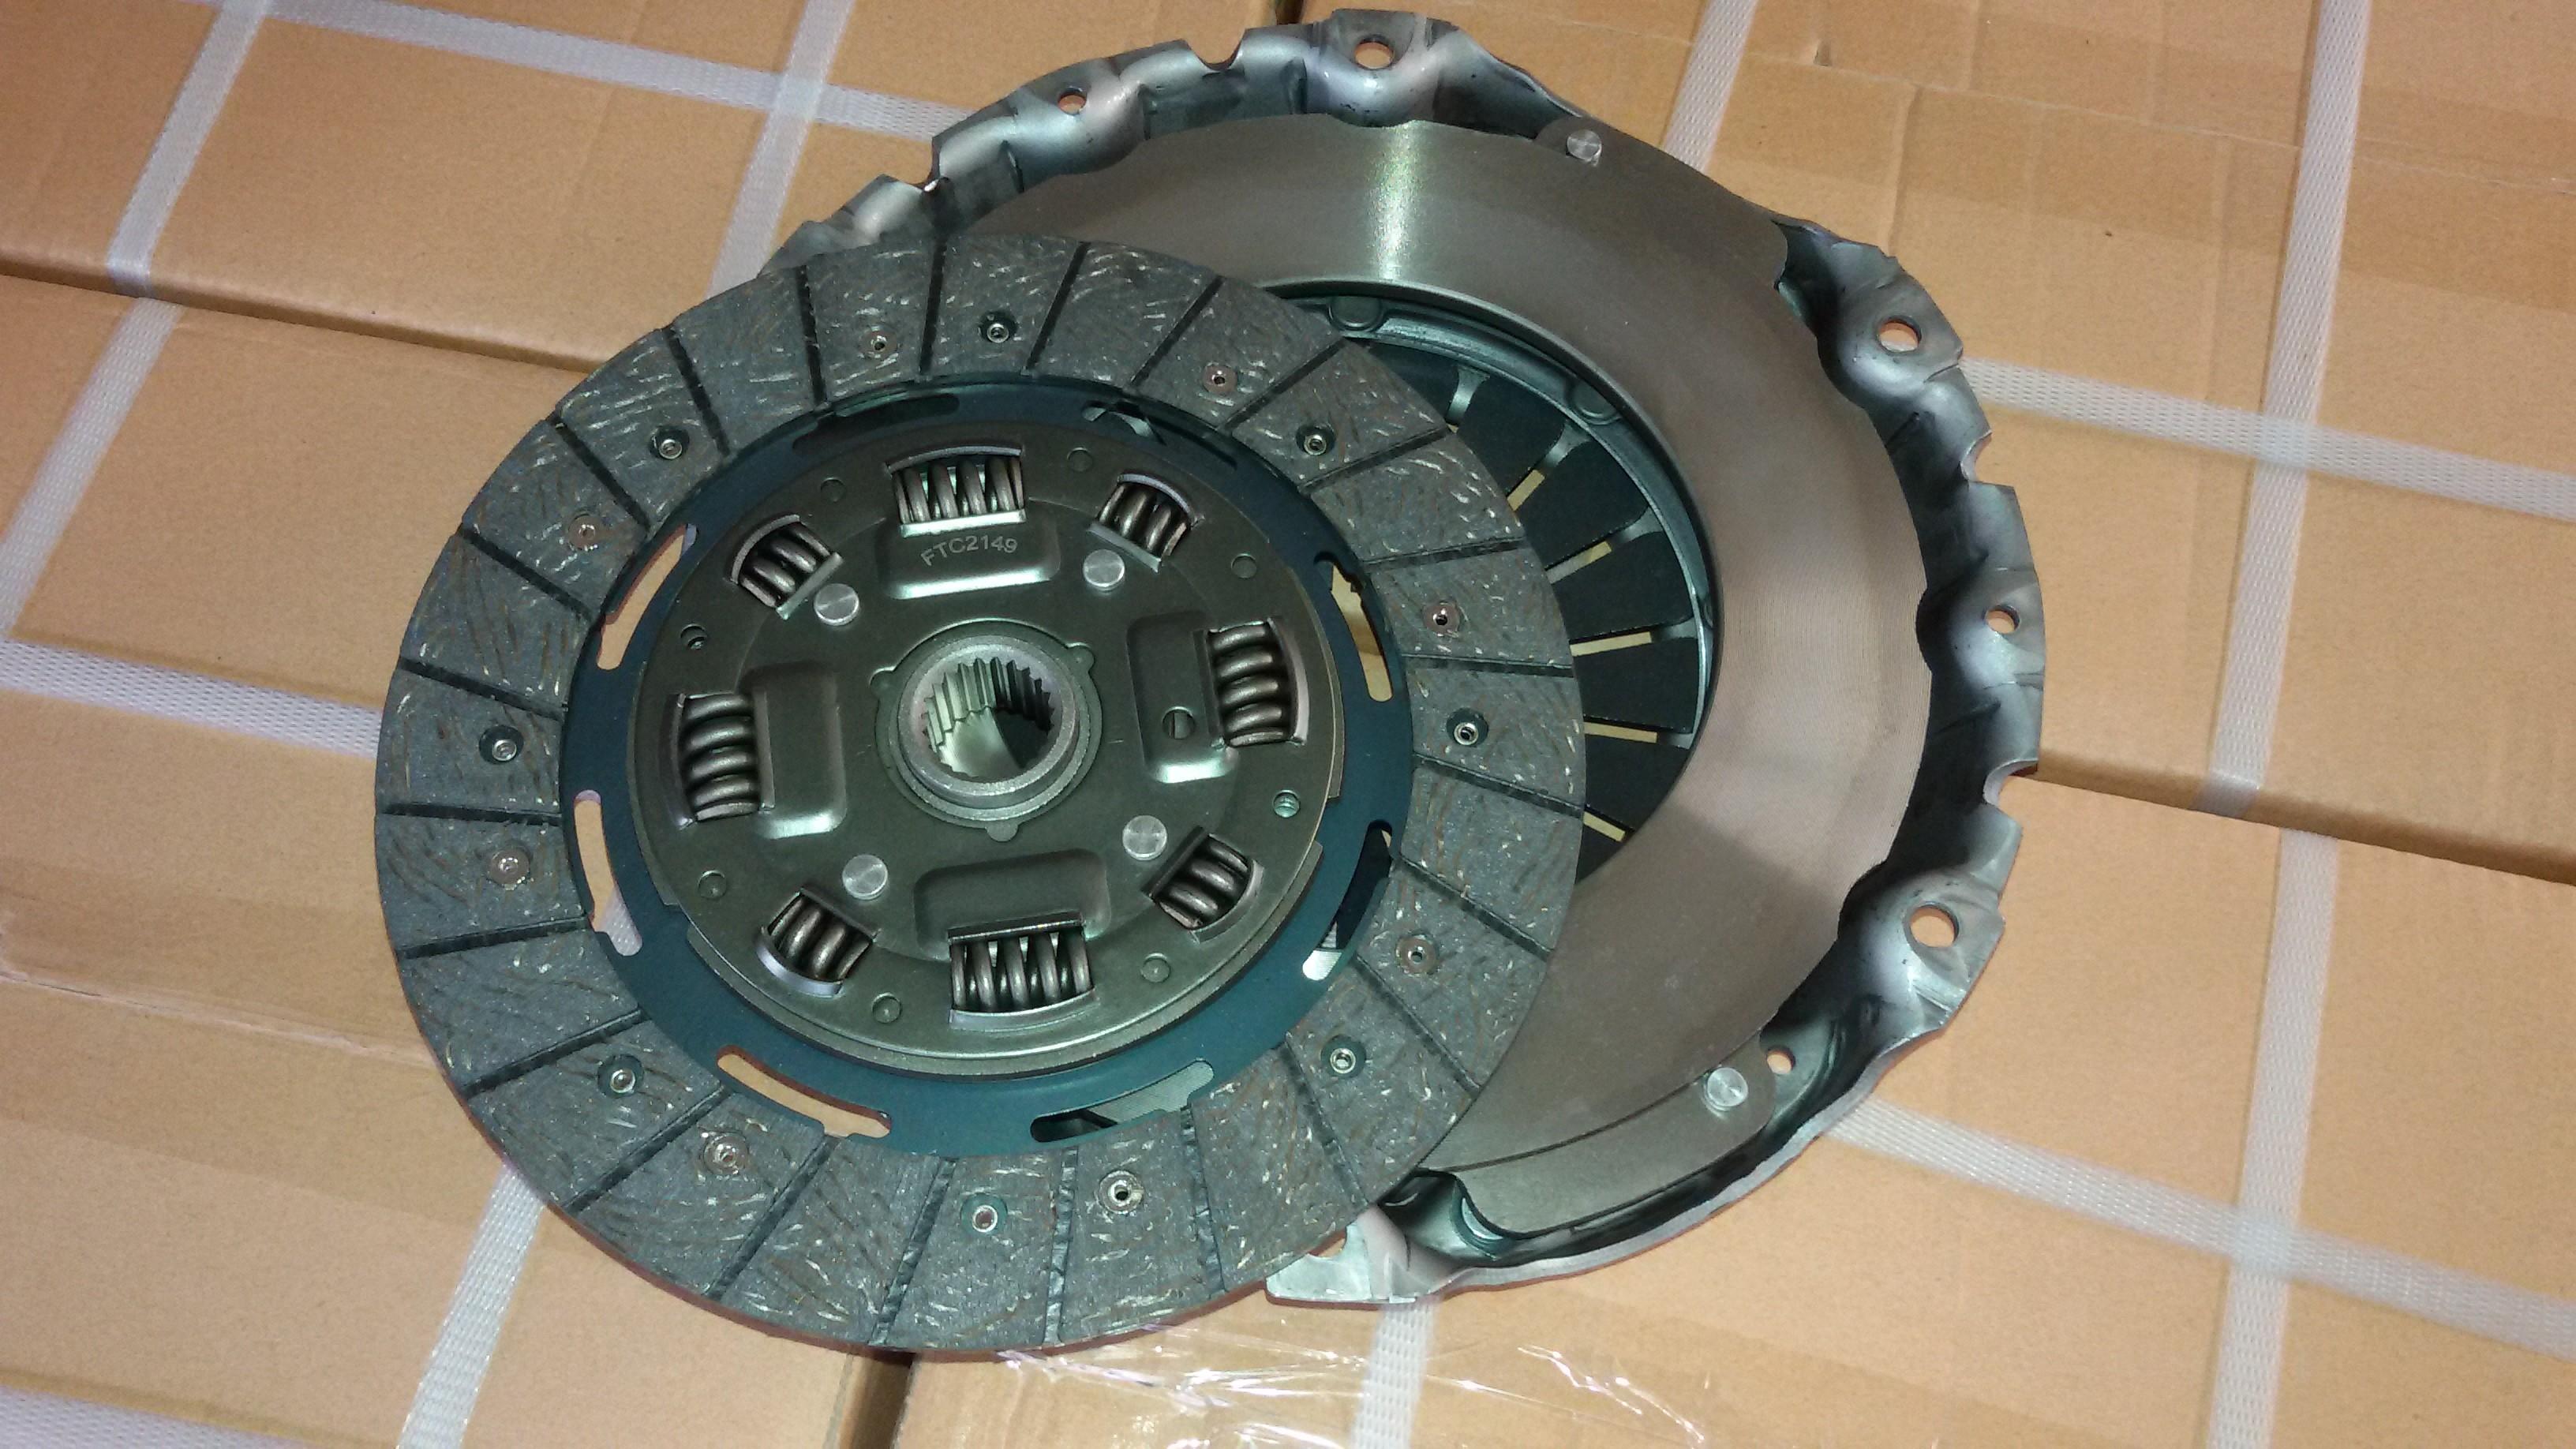 LUK 627 3009 00 (627300900) Clutch Kit for sale – CLUTCH